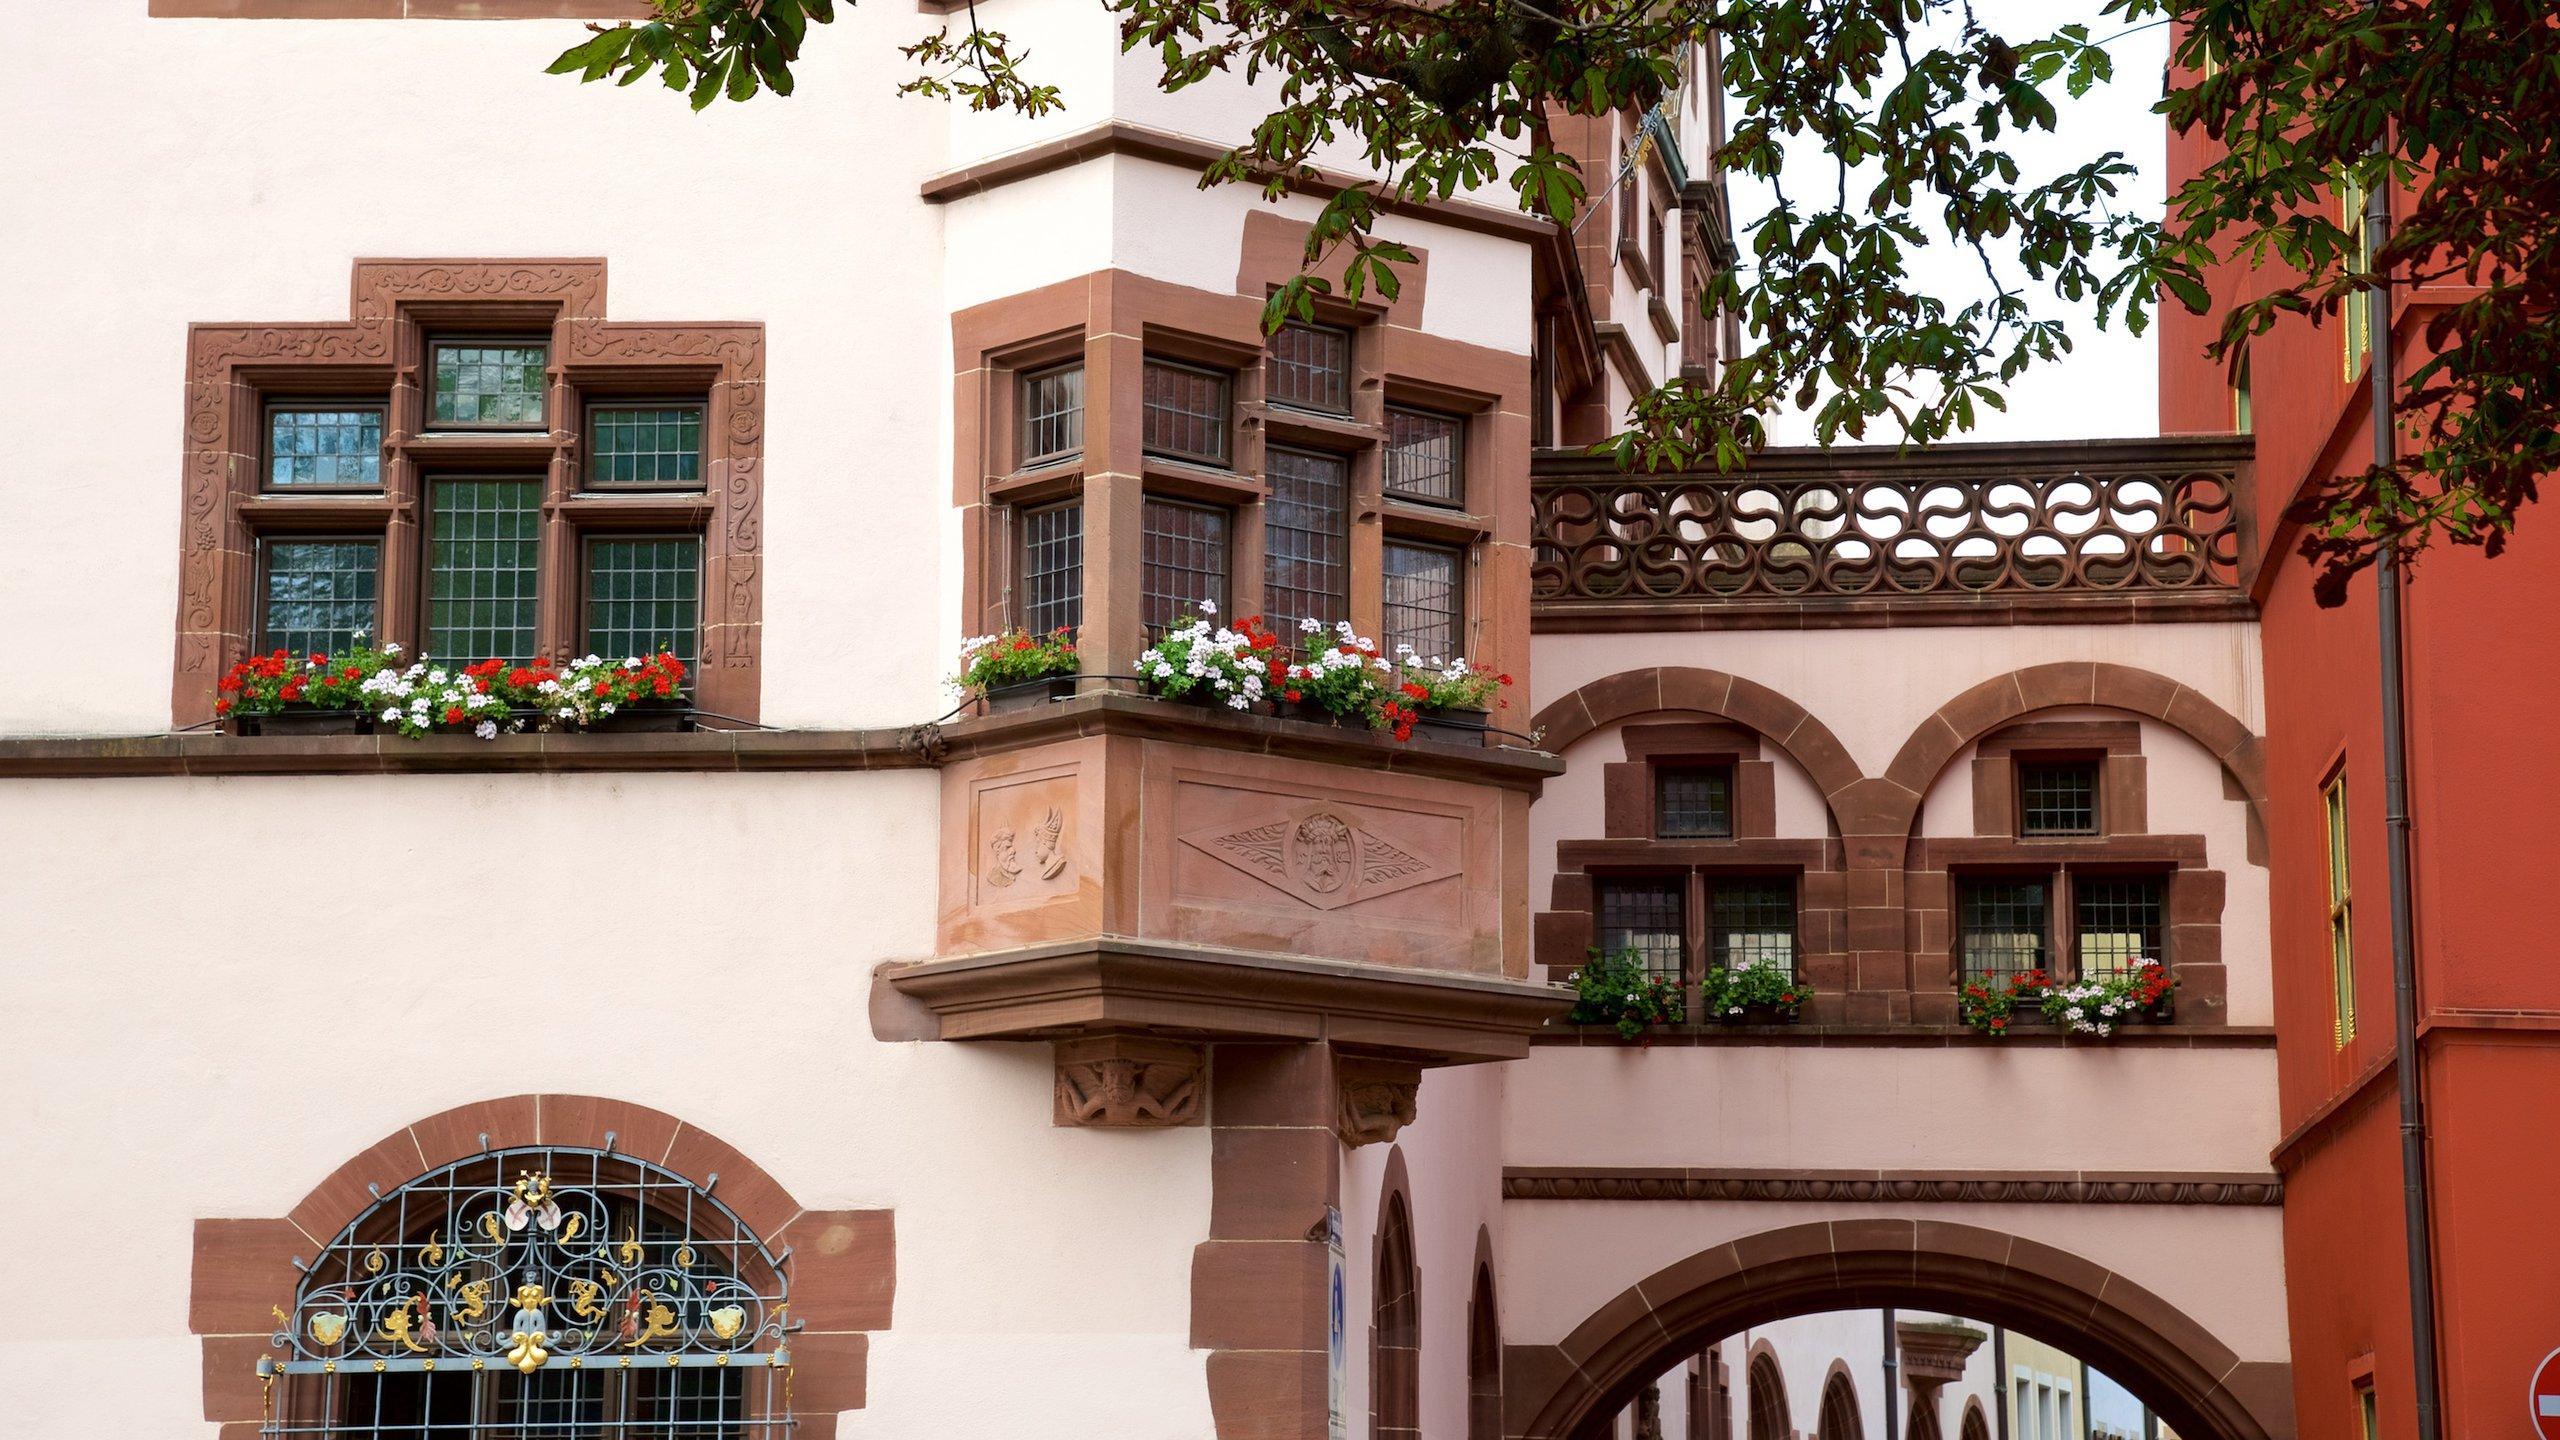 Old Town Hall (Altes Rathaus), Freiburg im Breisgau, Baden-Württemberg, Germany